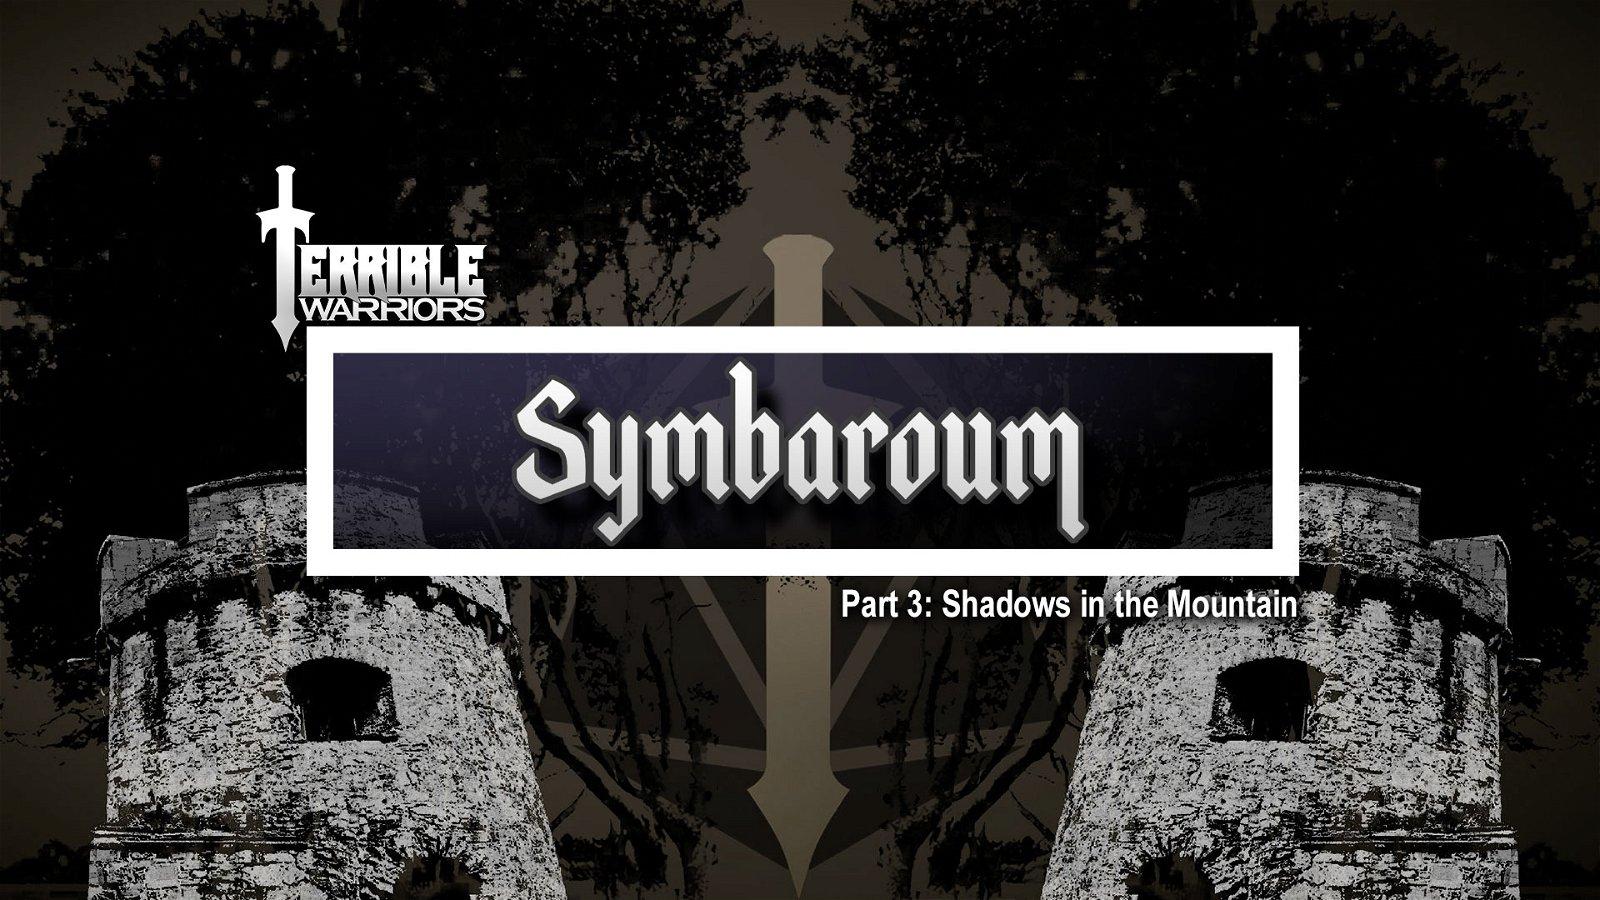 Terrible Warriors: Symbaroum, Part 2 1